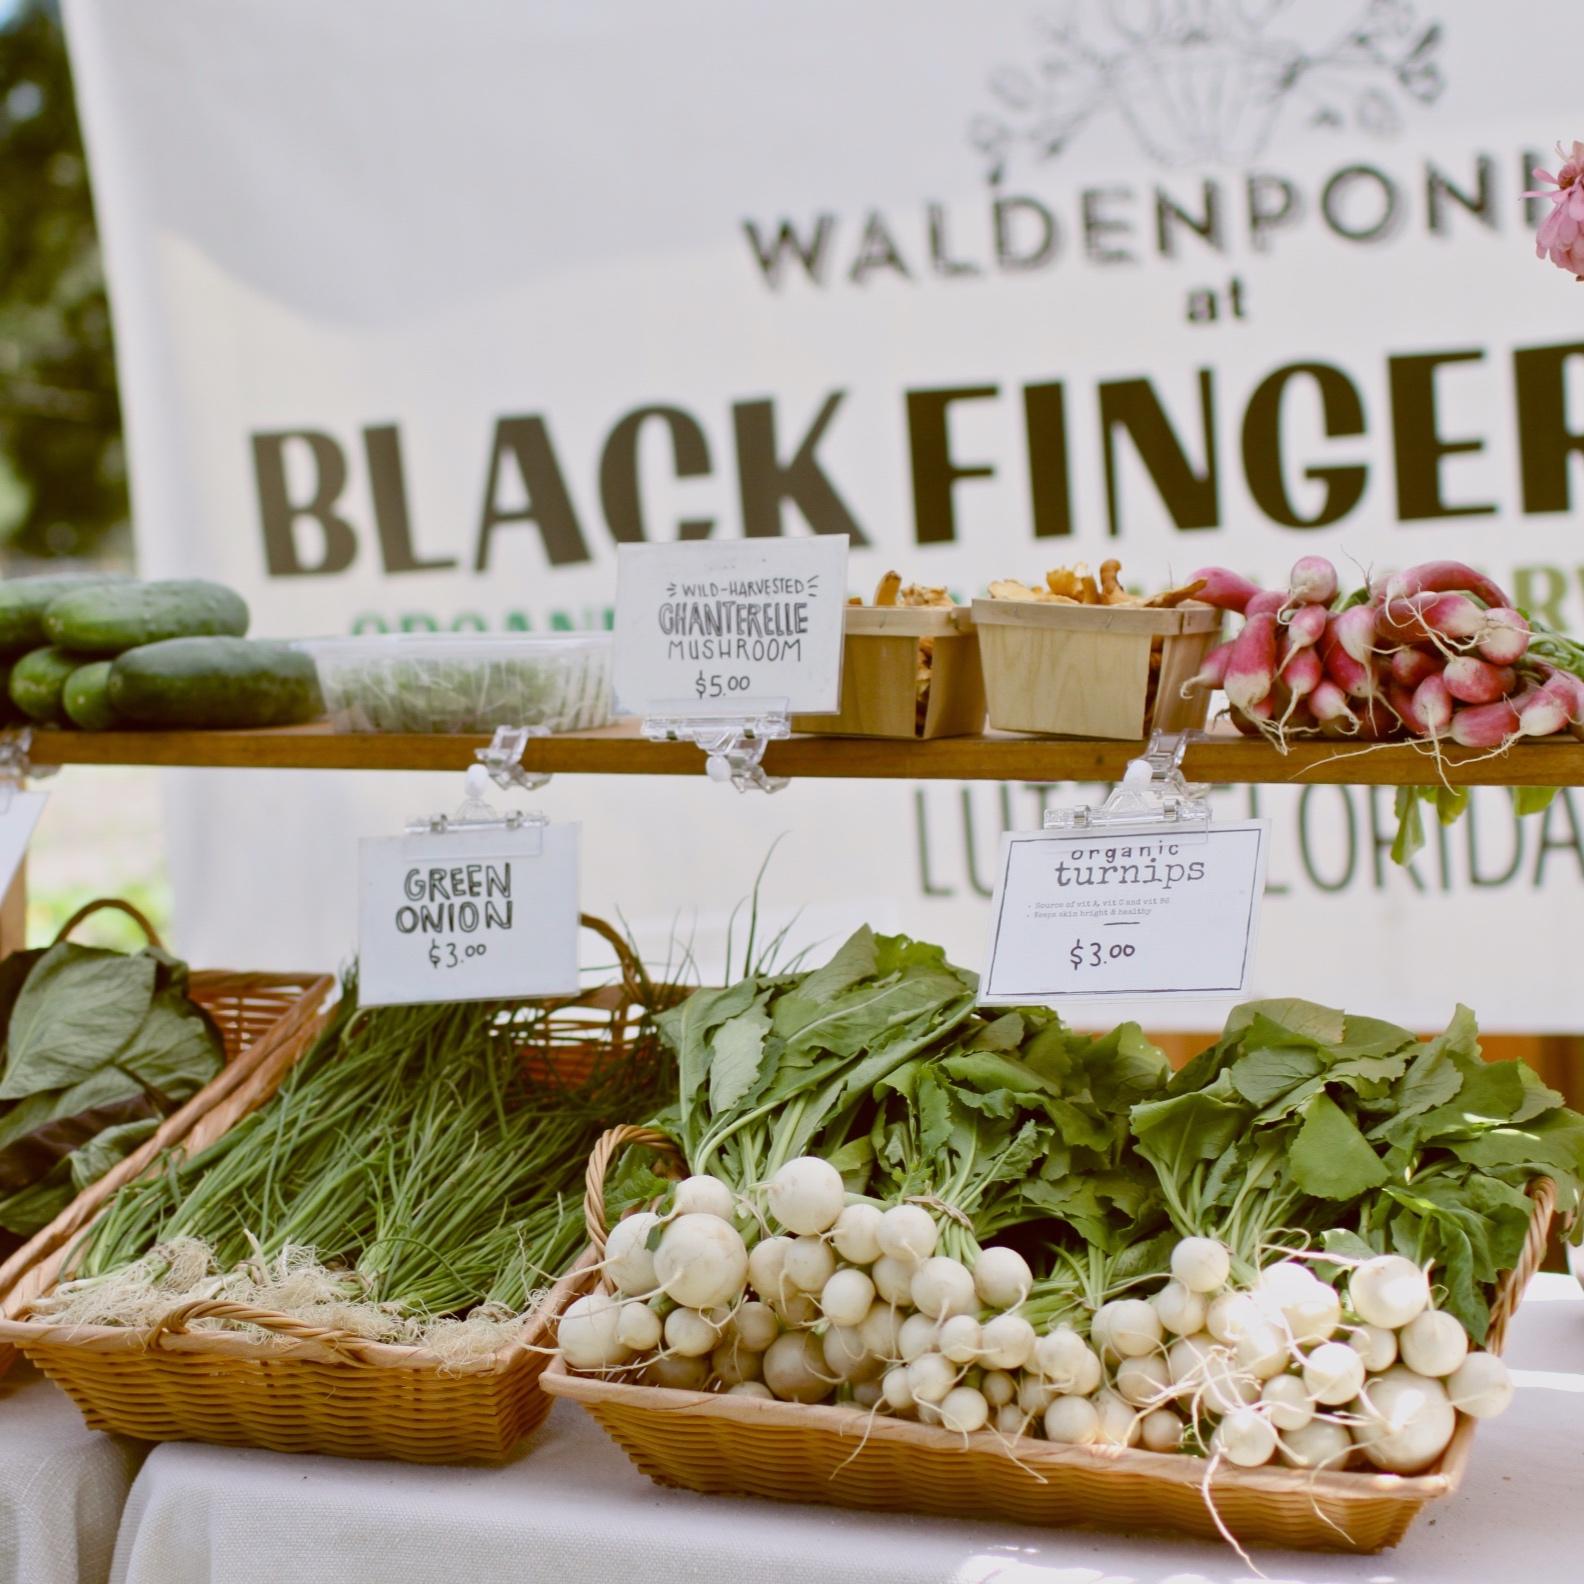 BLACK FINGER FARMLUTZ - Fridays 10am - Sunday 8pm (Self-Serve) | Produce available to Public, 6109 Lakeside Drive, Lutz, FL, 33558